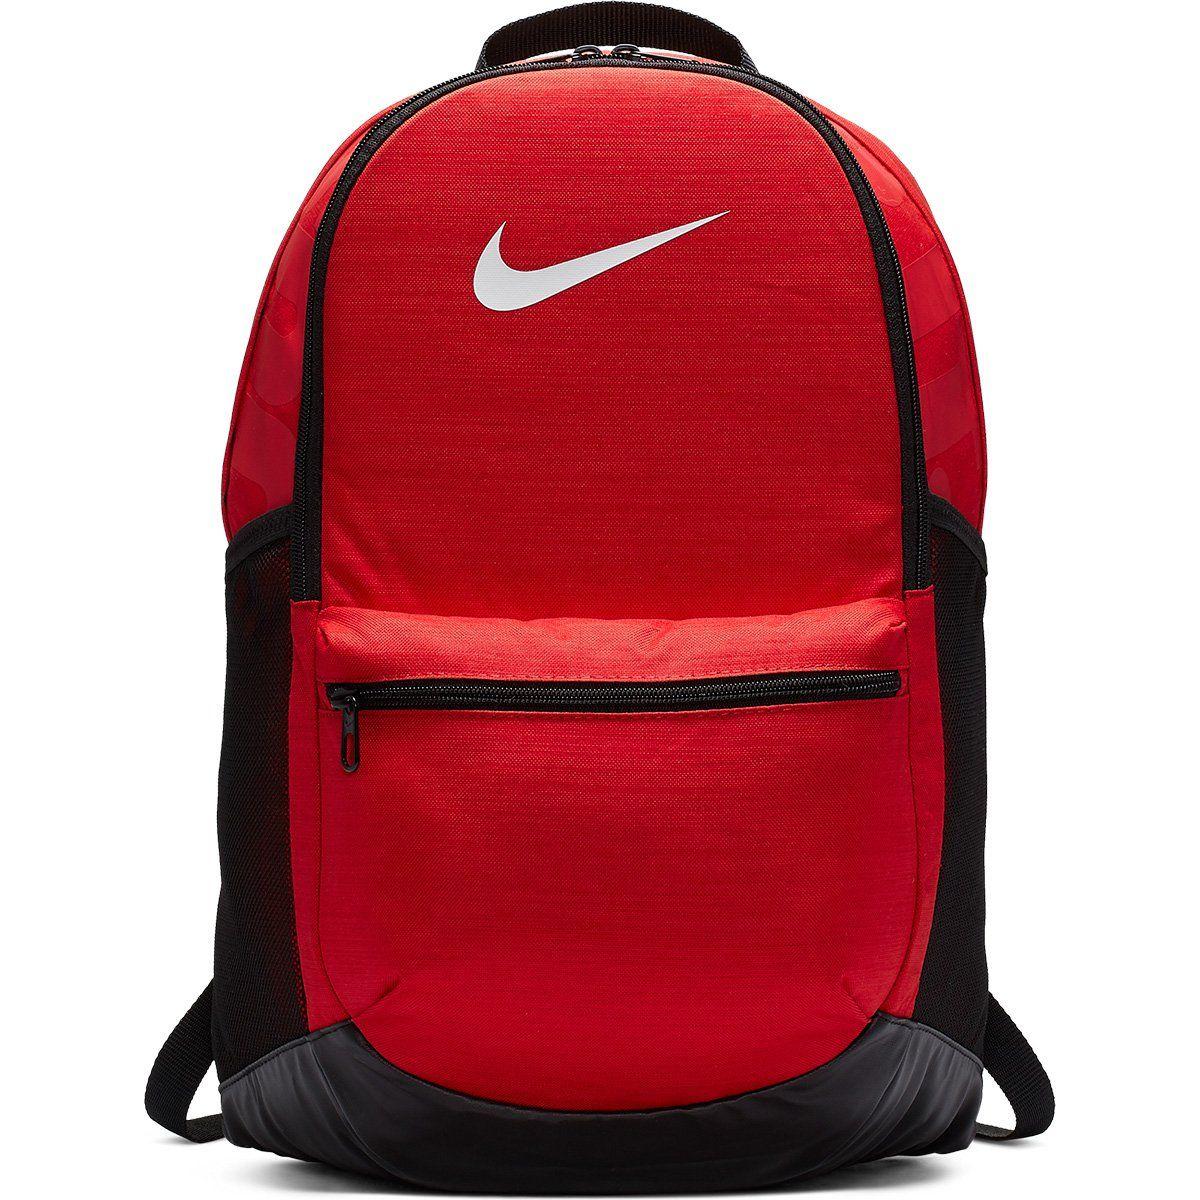 Mochila Nike Brasília M 24 Litros Vermelho e Preto